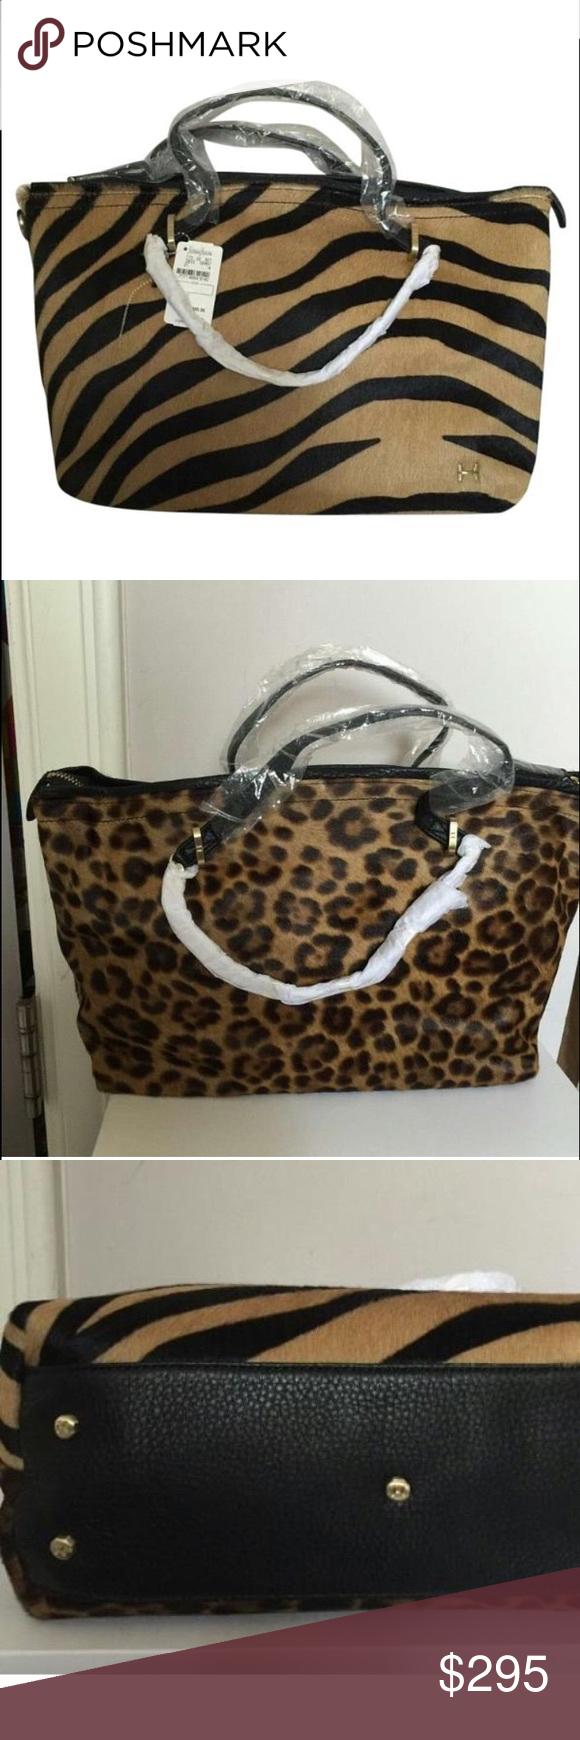 c61ddfc6cfc New tote 👜 bag🎊Sale🎉🎉   Bag sale, Halston heritage and Stylists